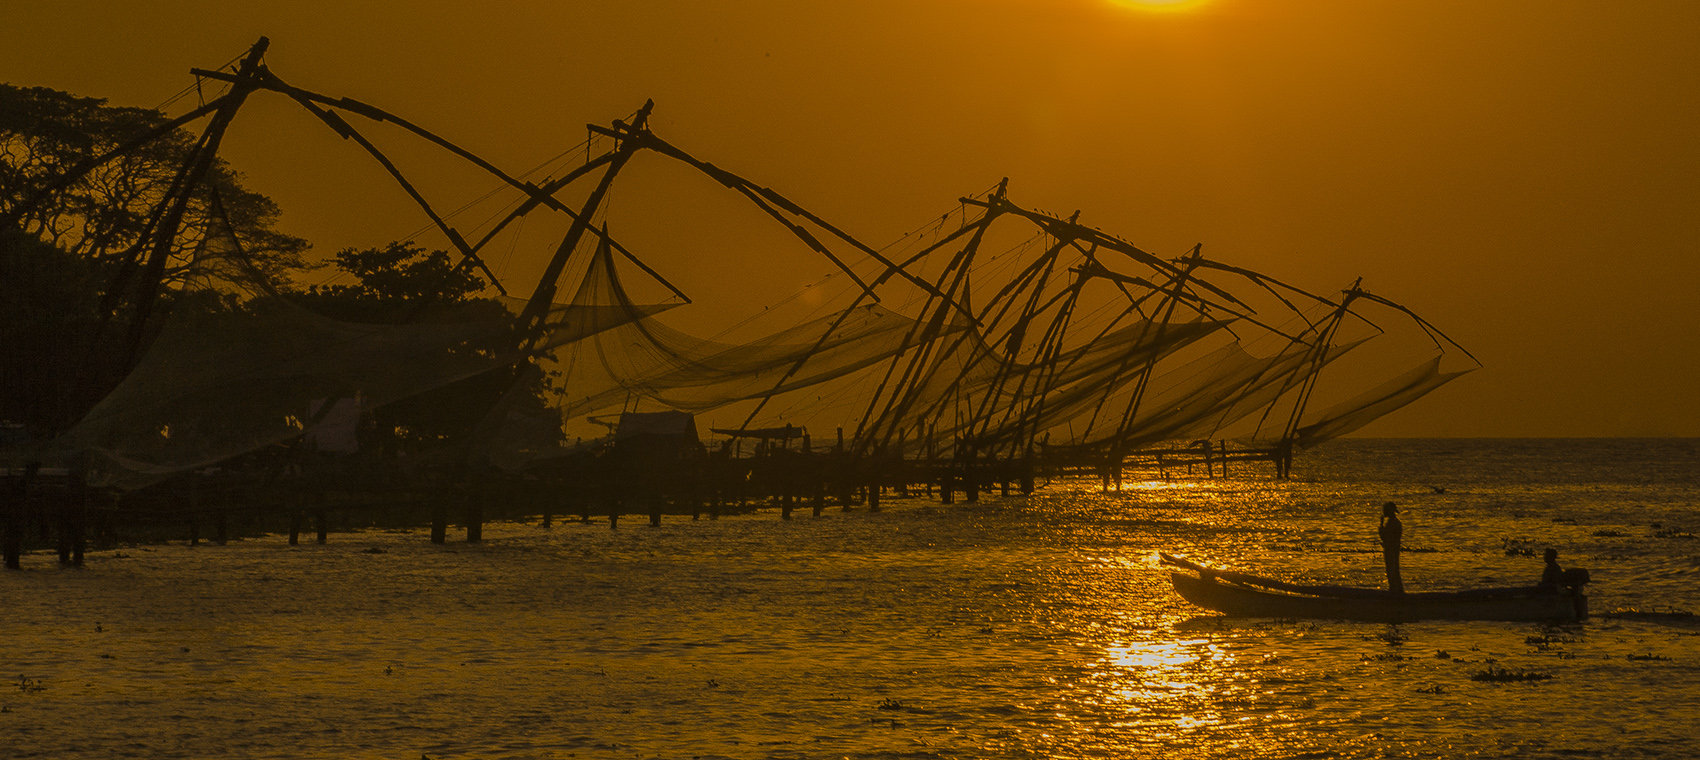 Chinese Fishing Nets, Kochin, India